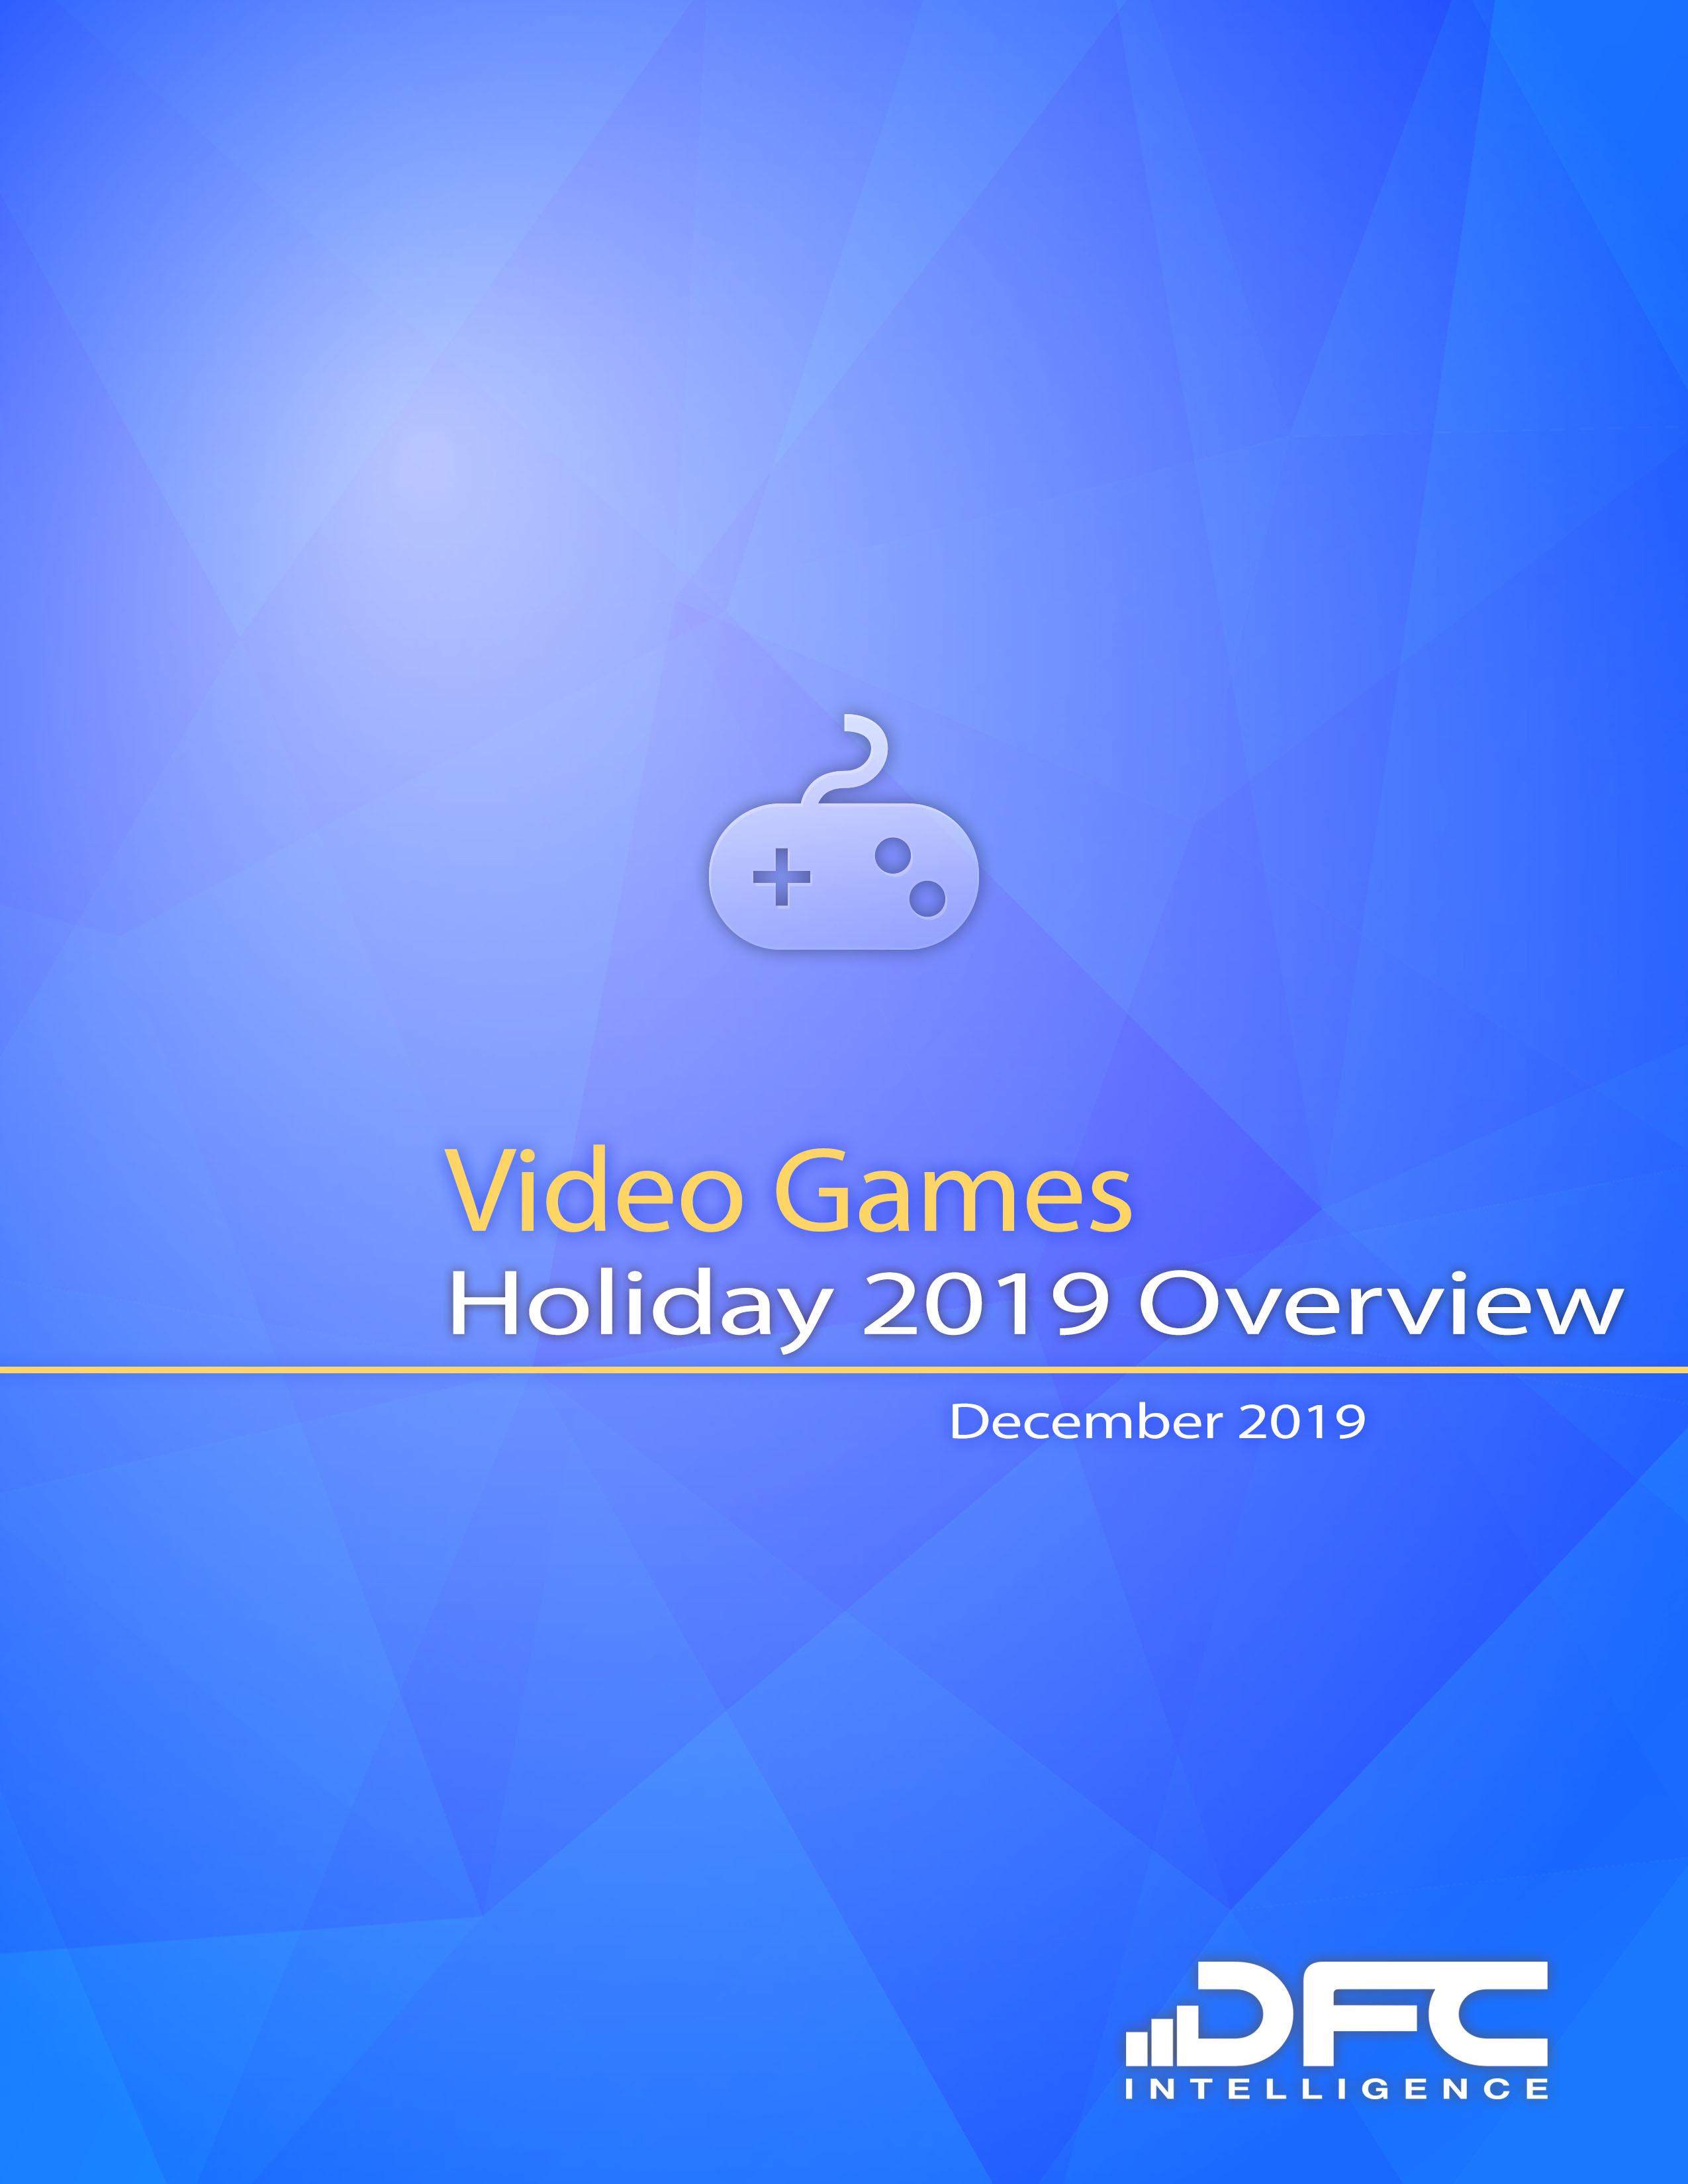 2019 video game sales